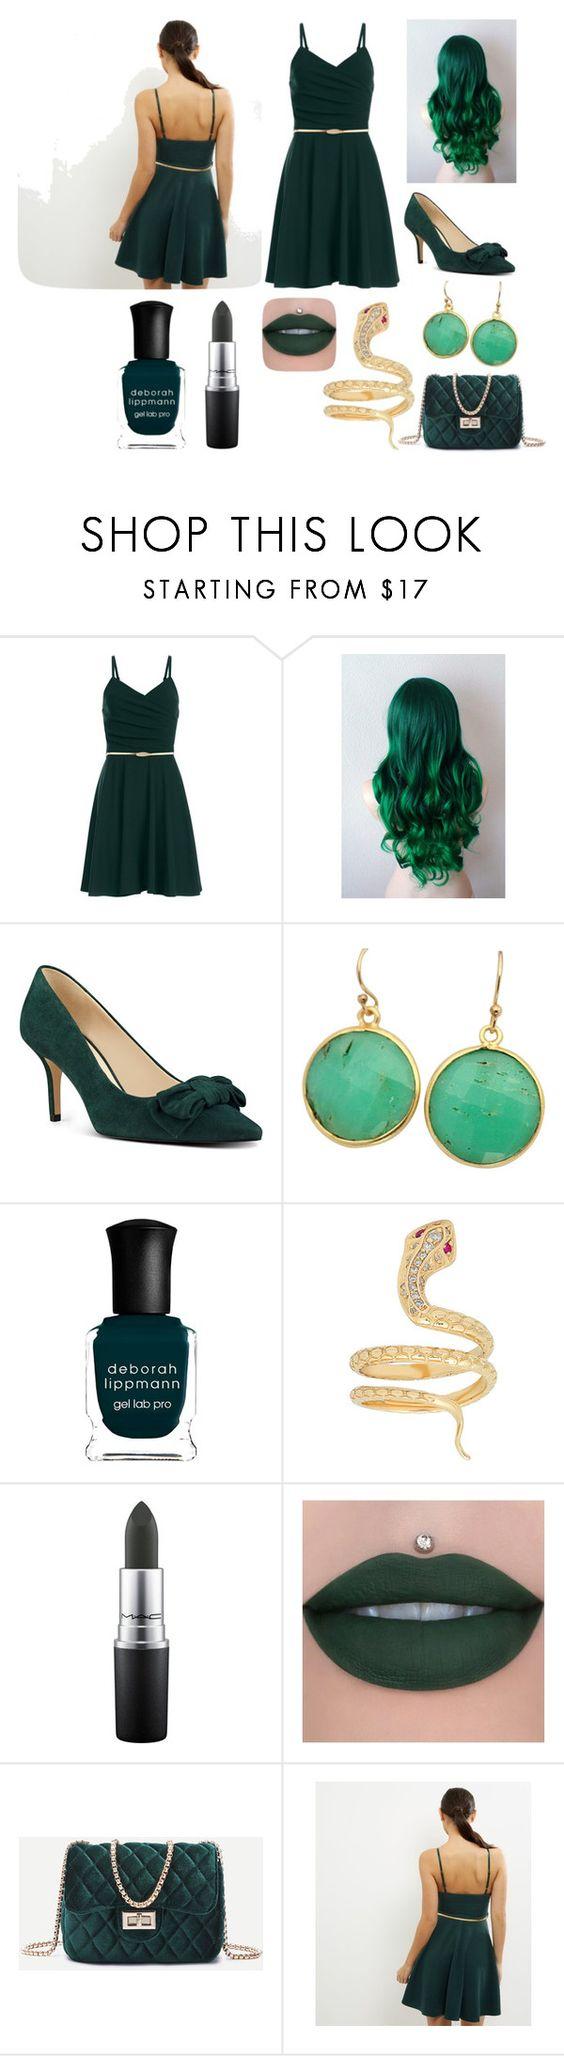 """Dark Green"" by madmaggie20 on Polyvore featuring moda, Nine West, Blue Candy Jewelry, Deborah Lippmann e MAC Cosmetics"